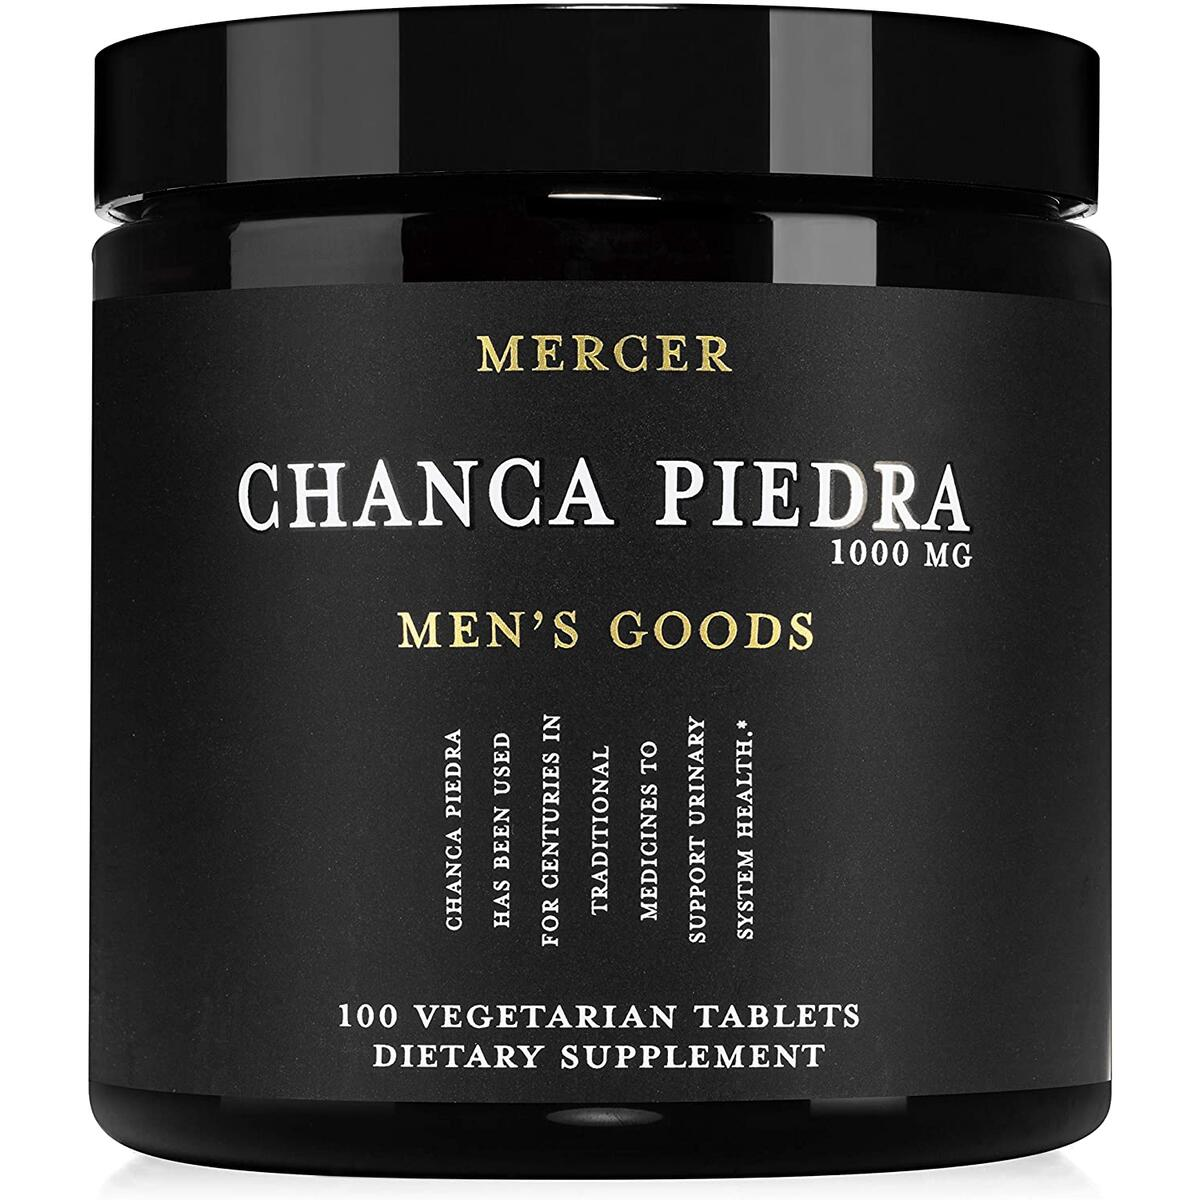 Mercer Chanca Piedra (Phyllanthus niruri) 1000mg